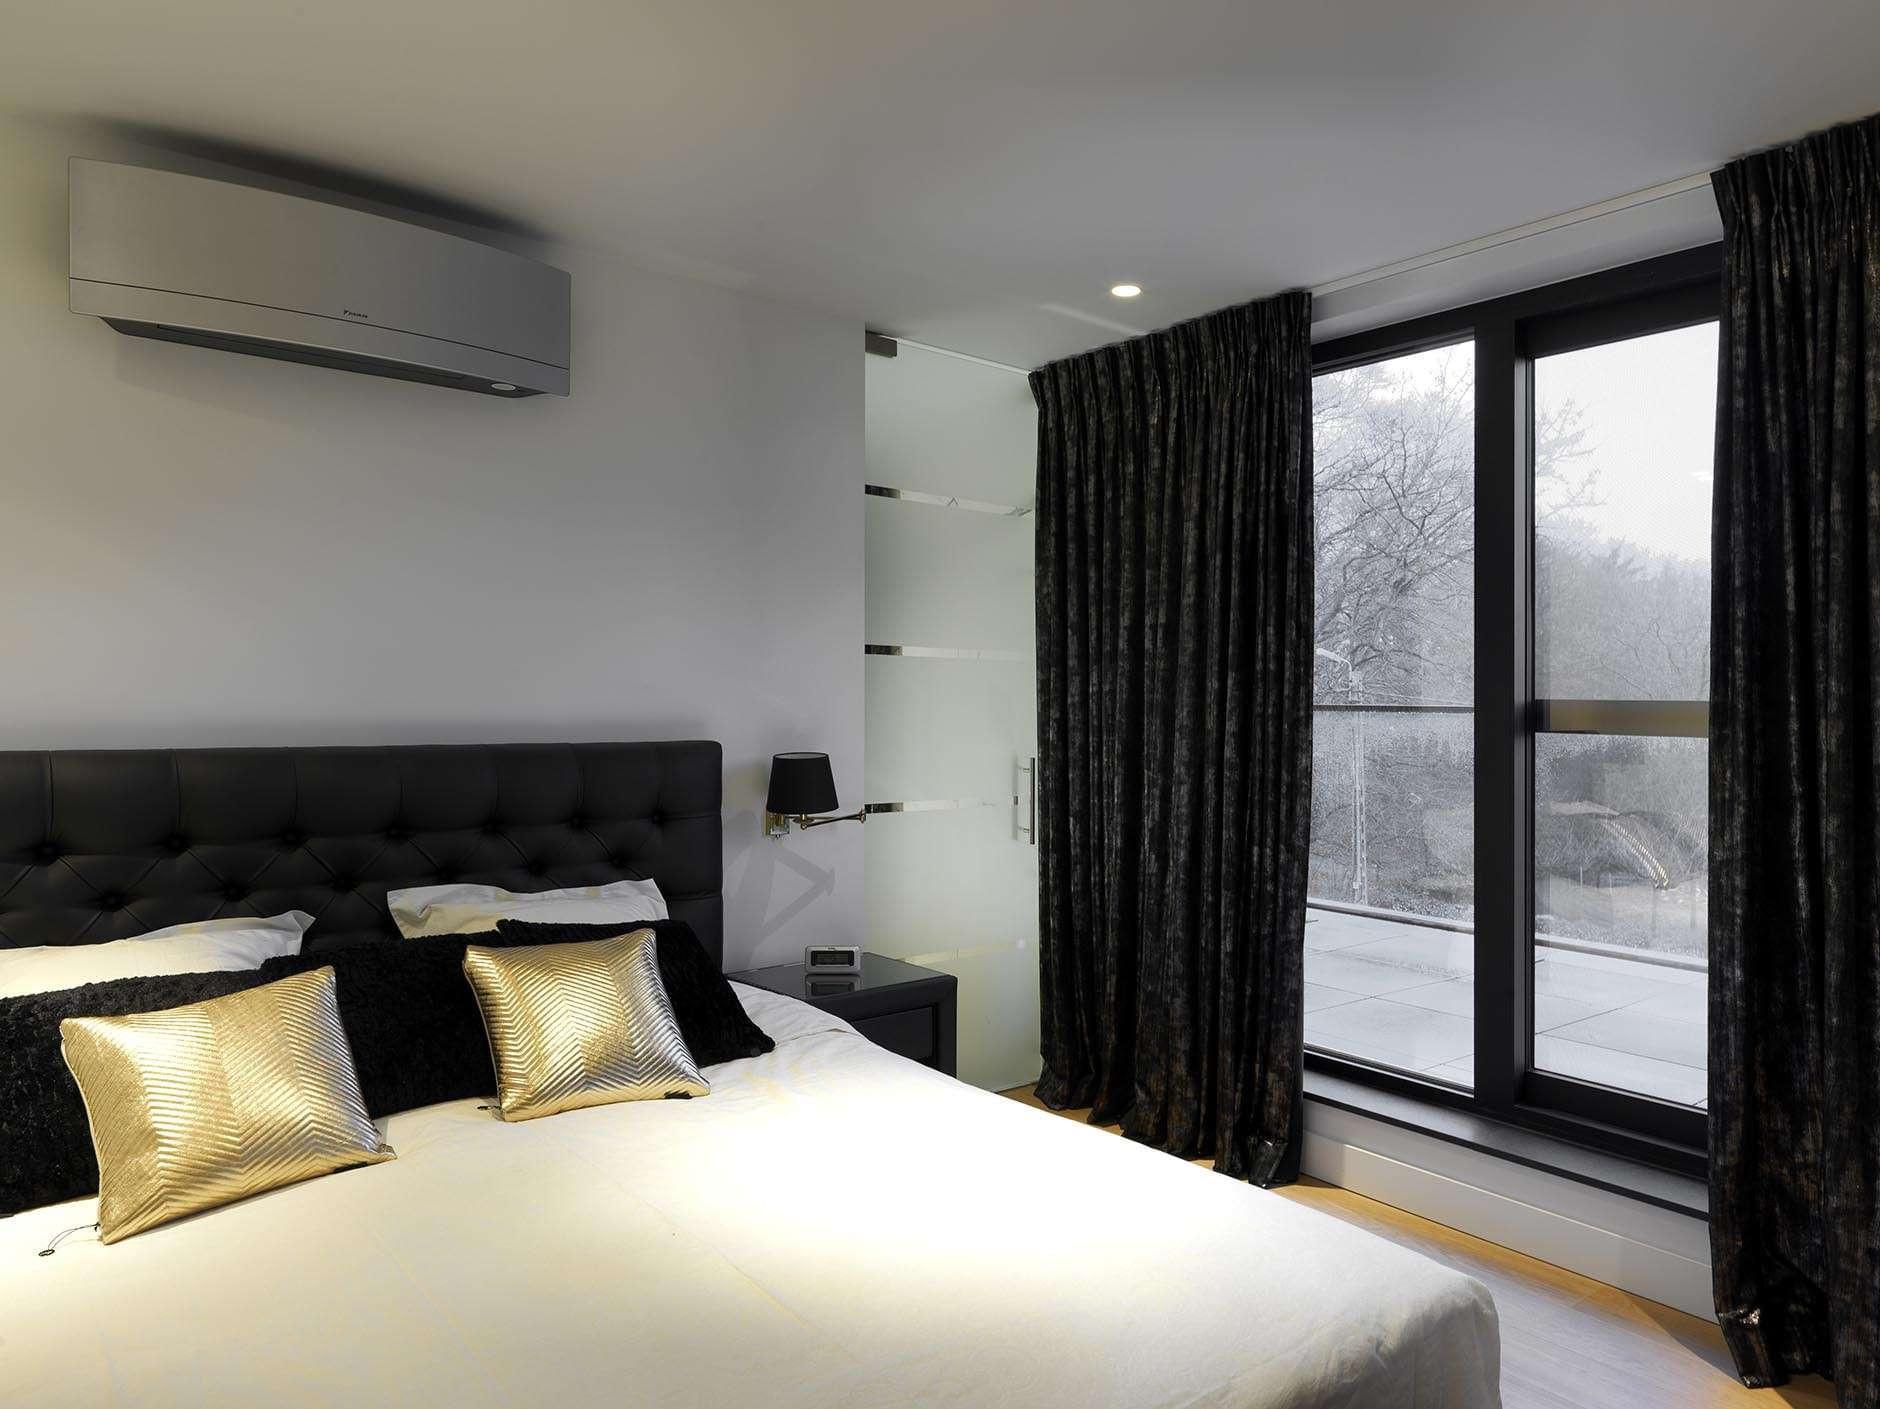 glazen-deur-slaapkamer